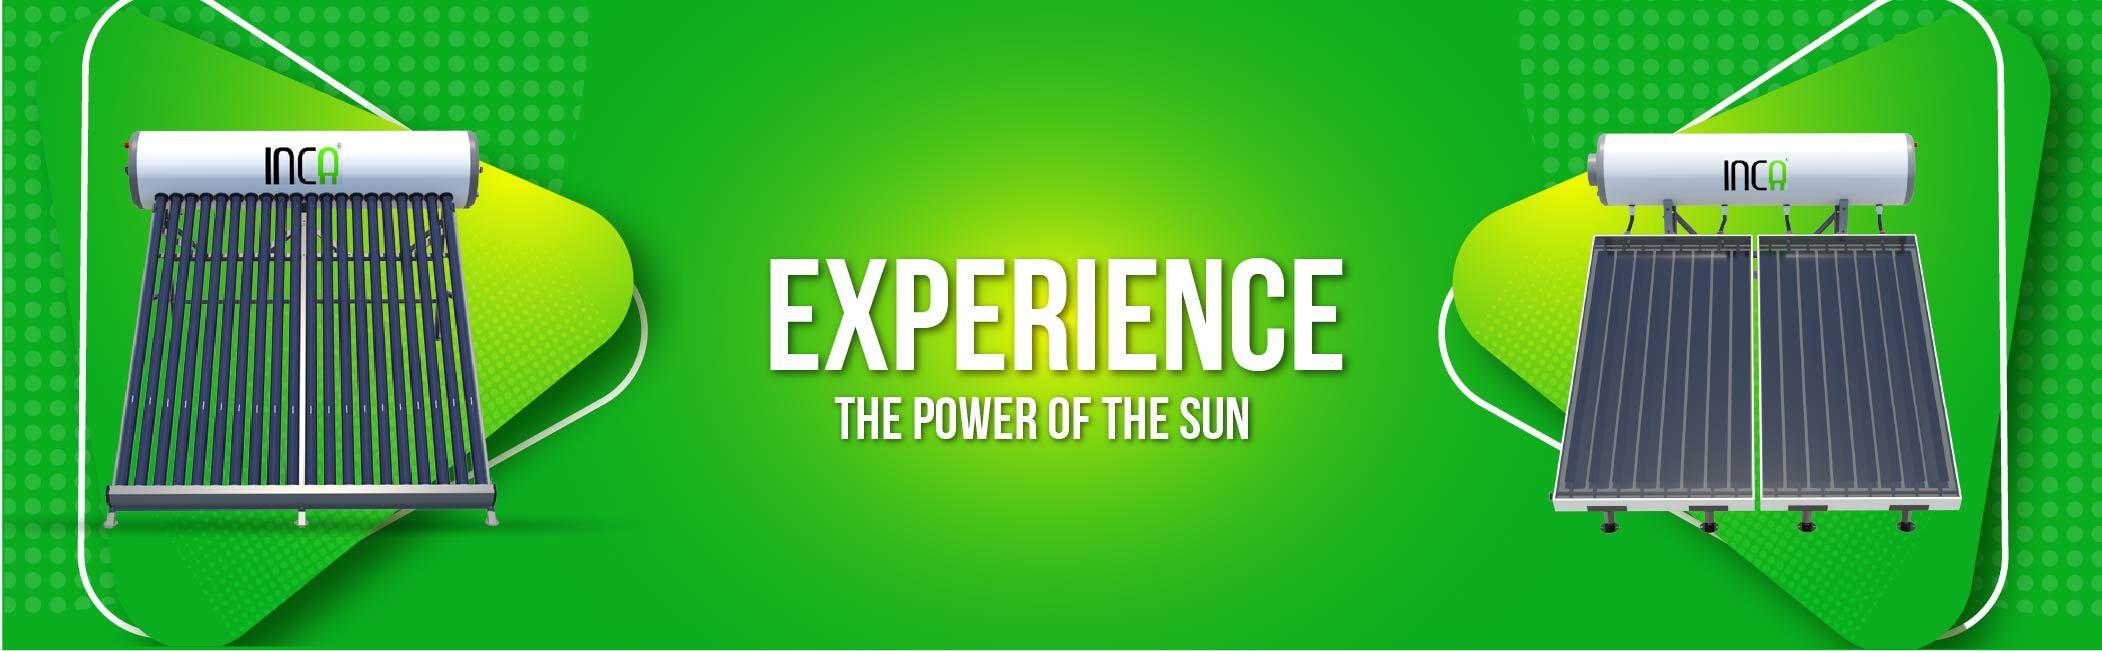 Inca - Professional Solar Power Solutions India